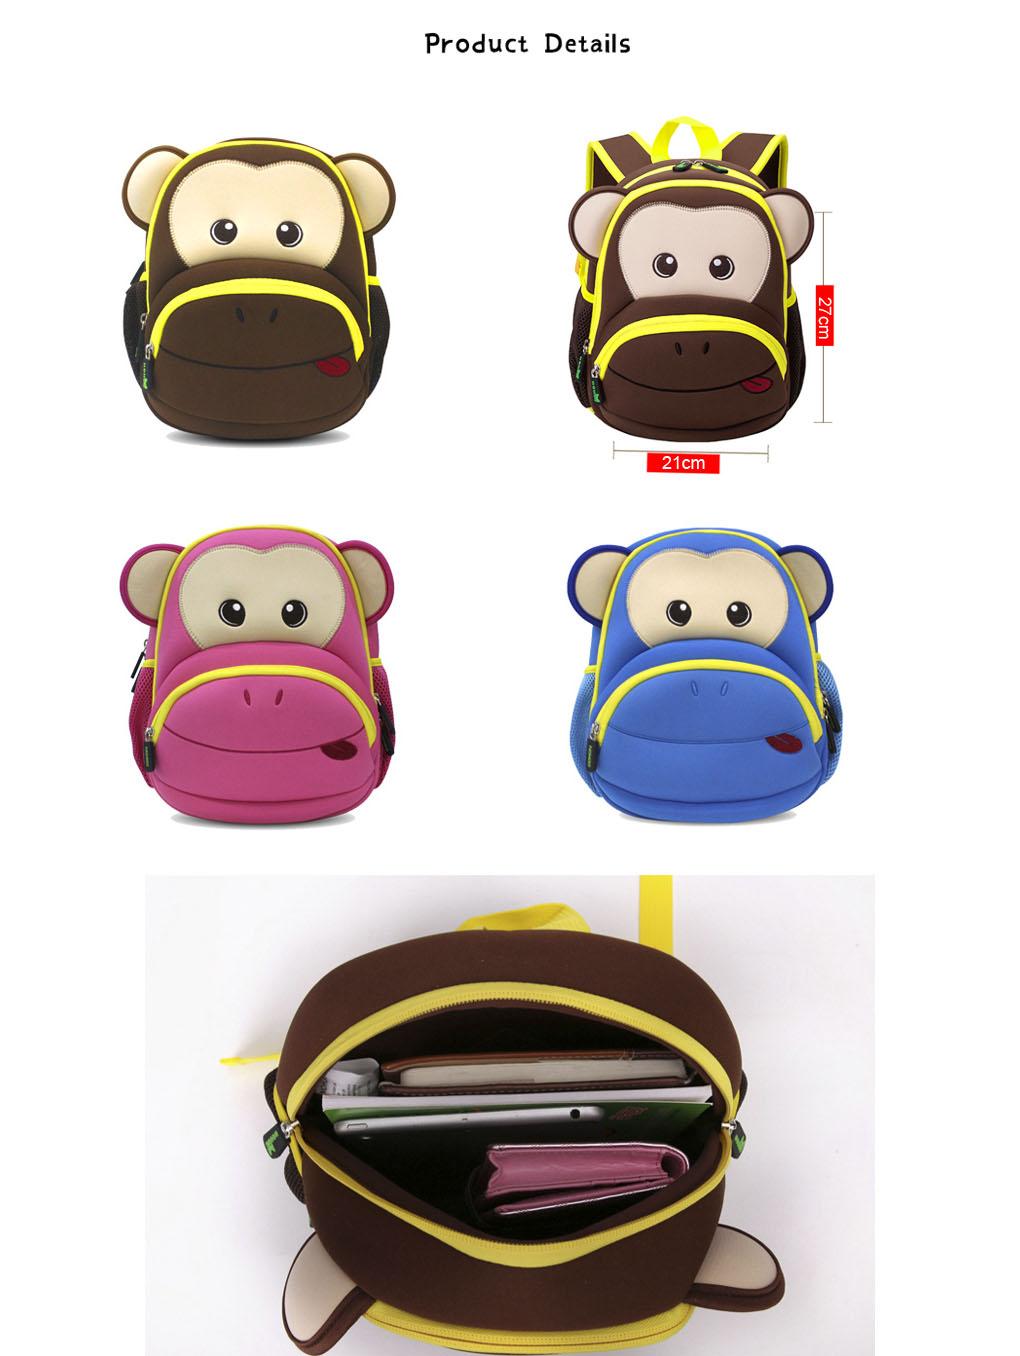 Nohoo Children Products-Find Neoprene Kid Backpack Cute Zoo Animal Monkey Cartoon Bag For Boys